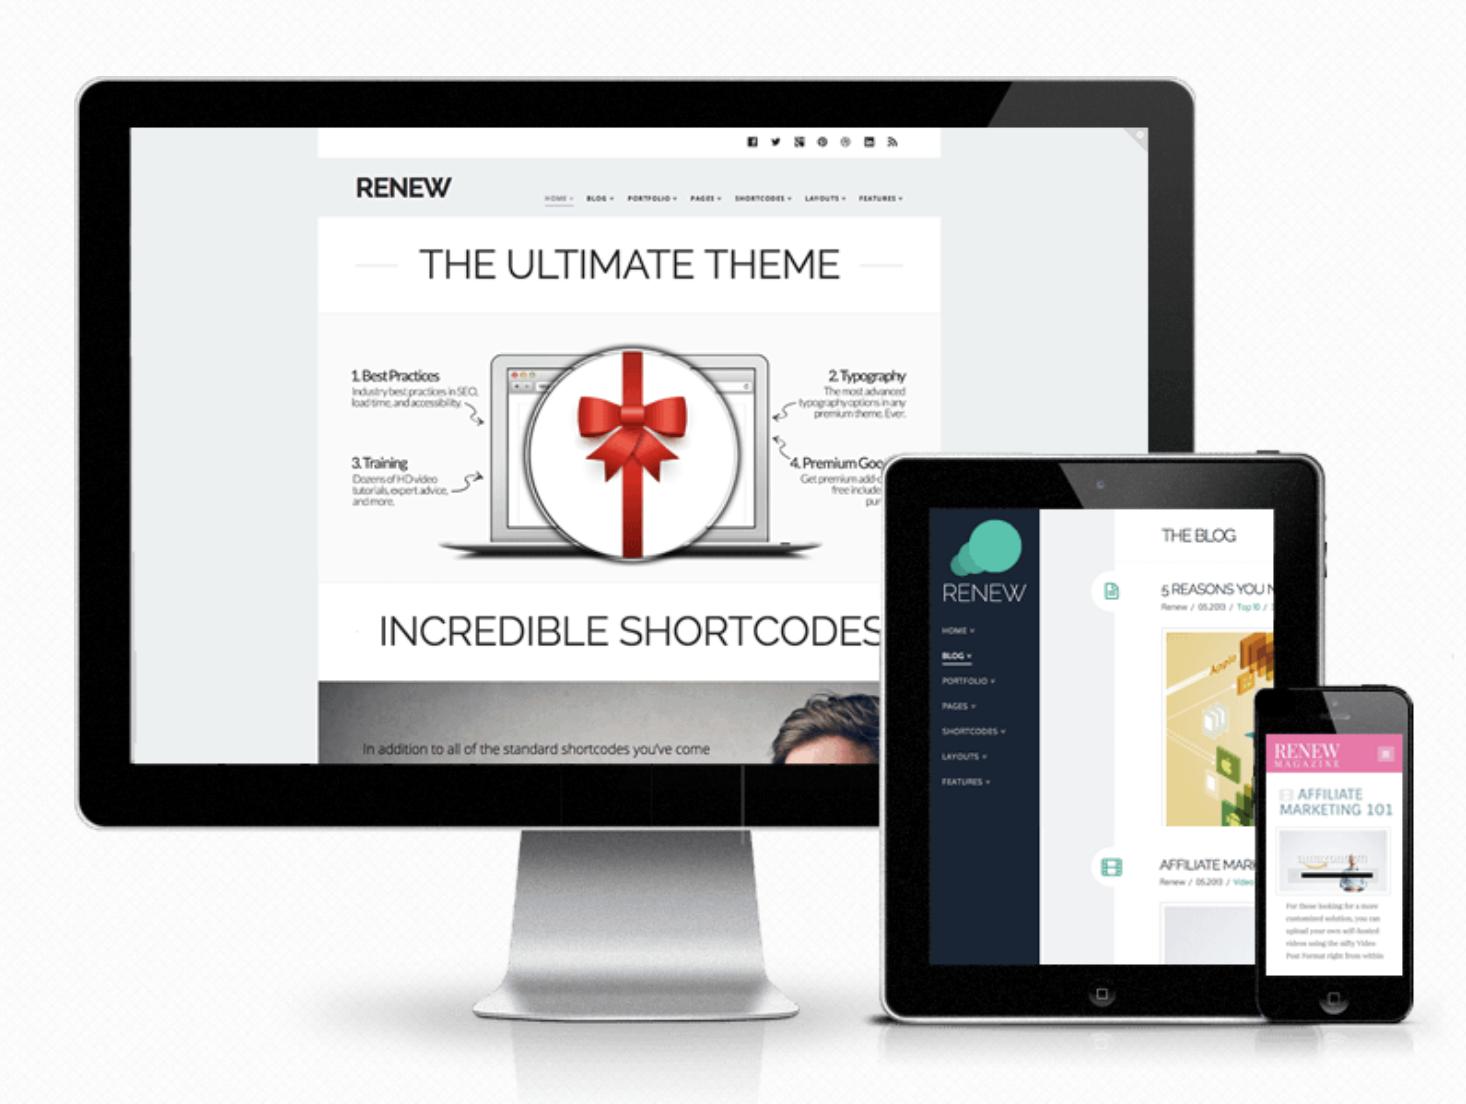 X Theme to create a static website using WordPress